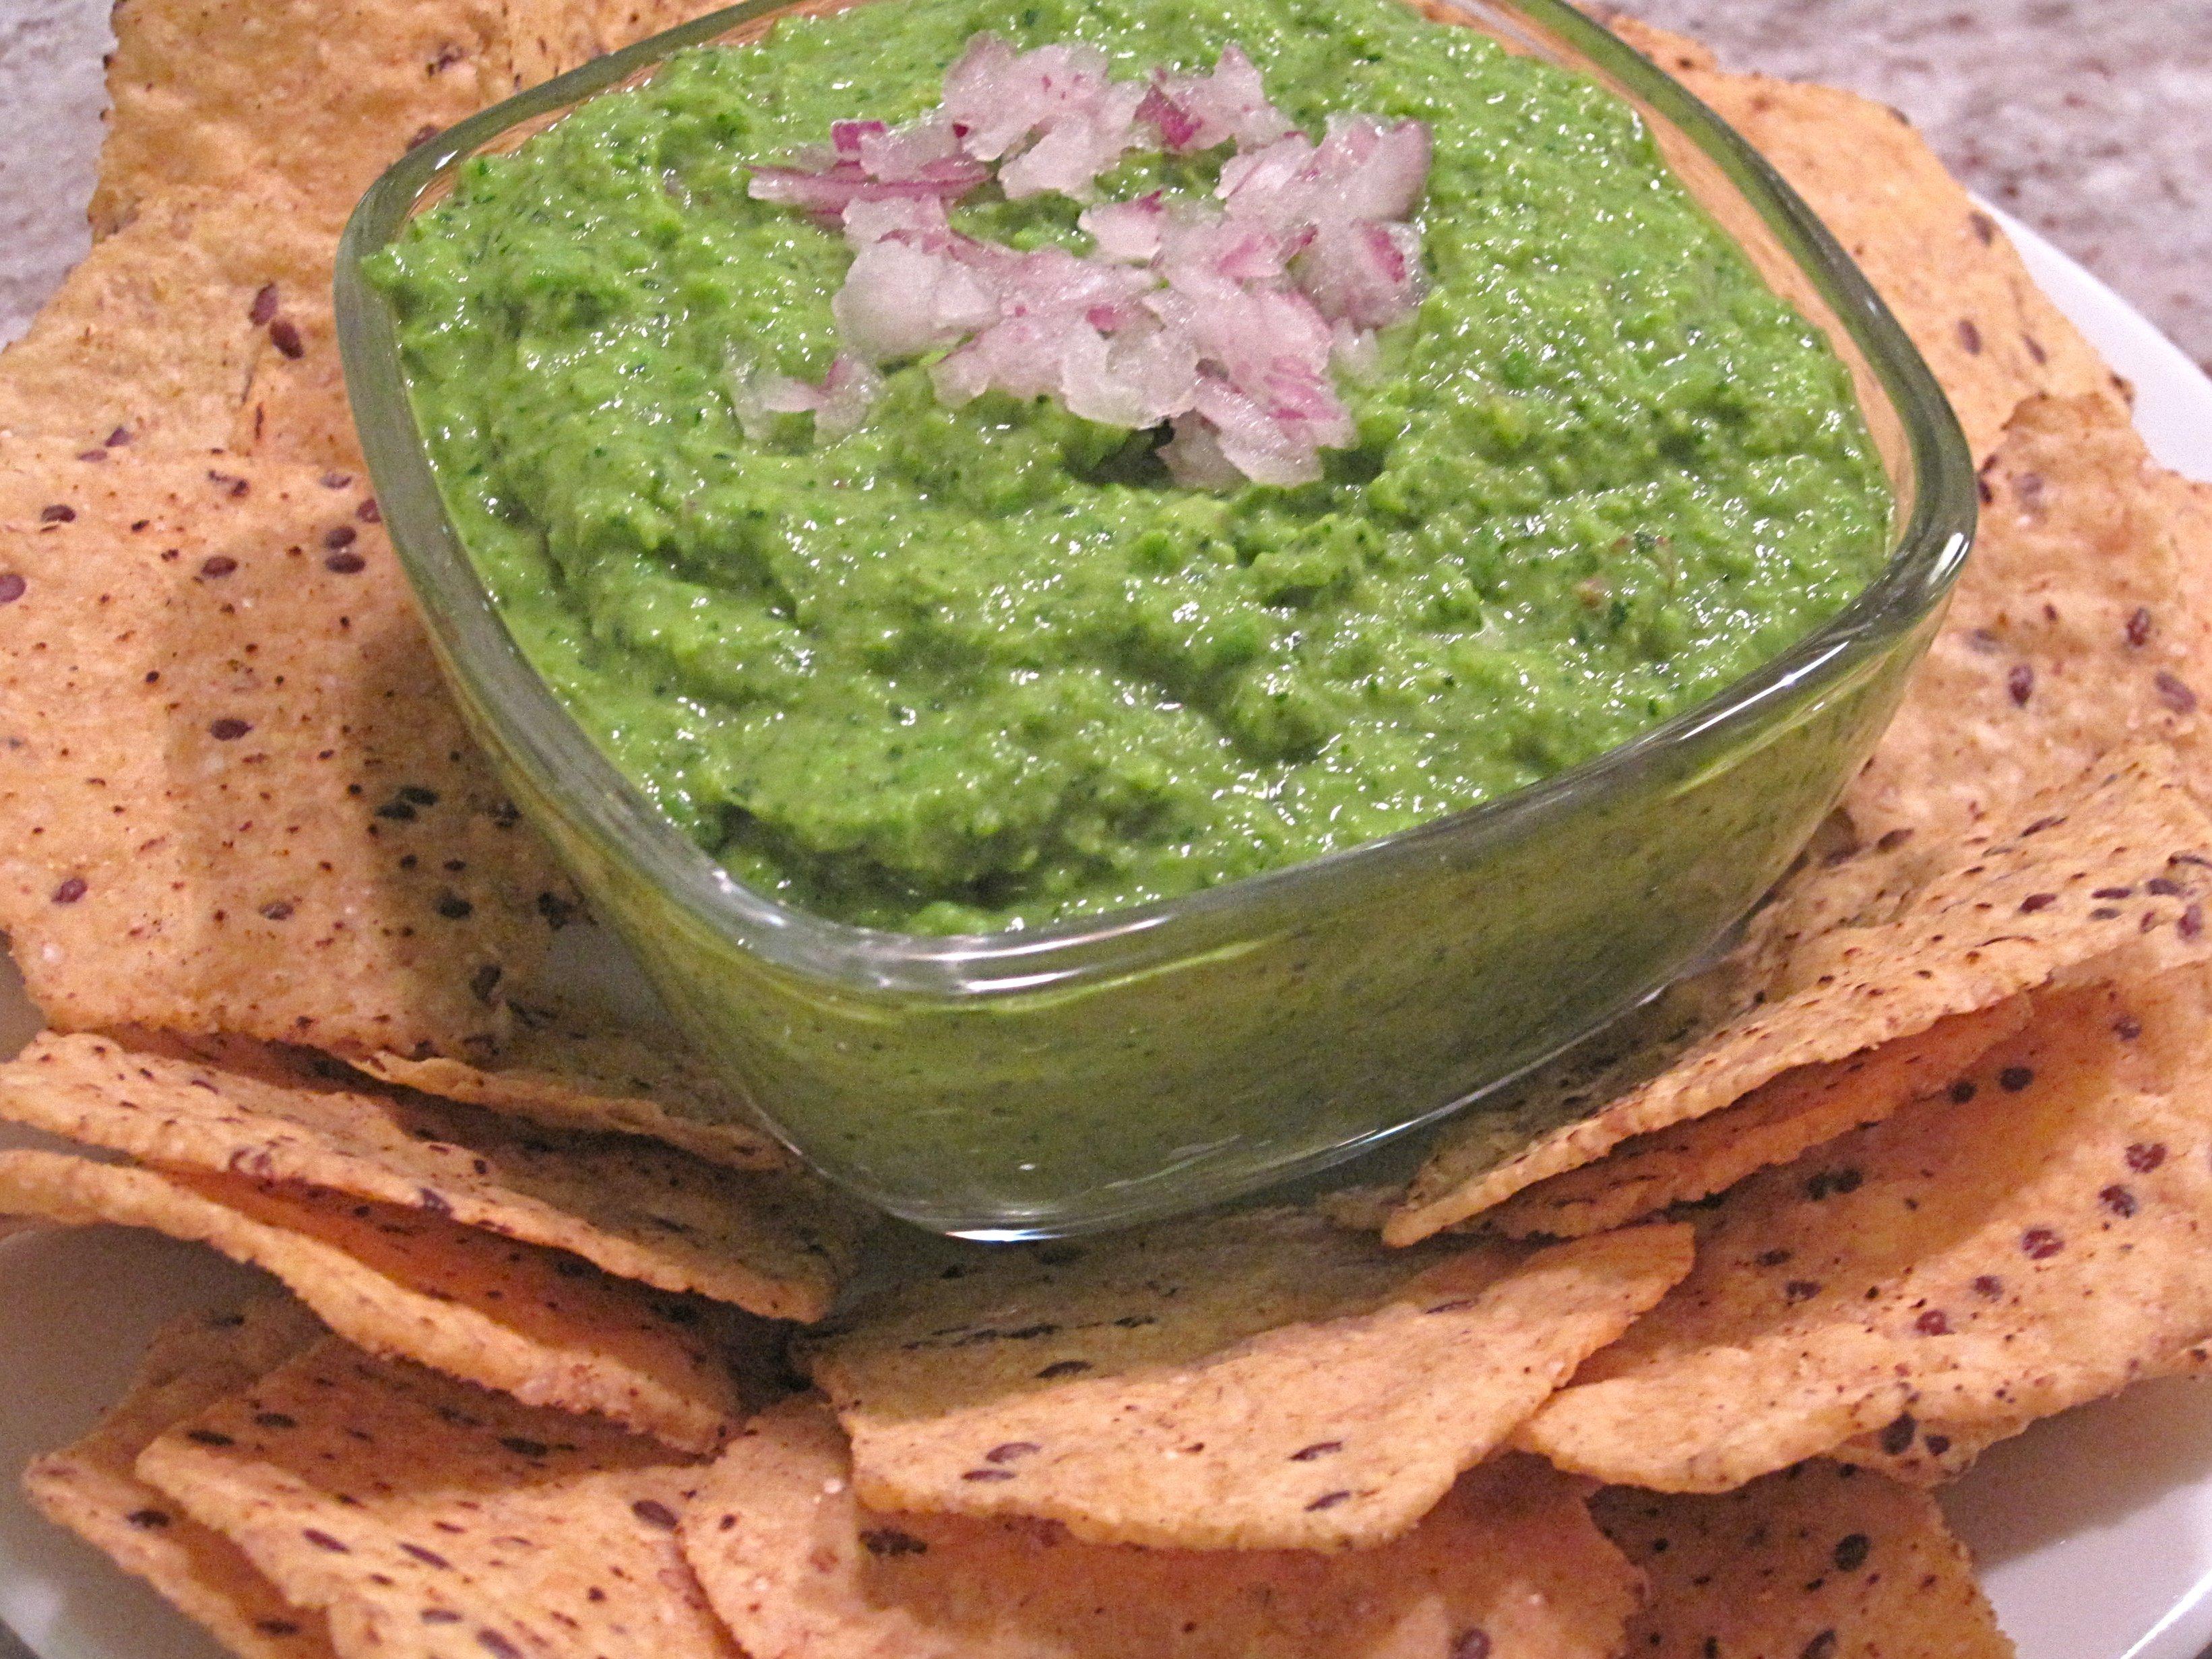 green-pea-guacamole